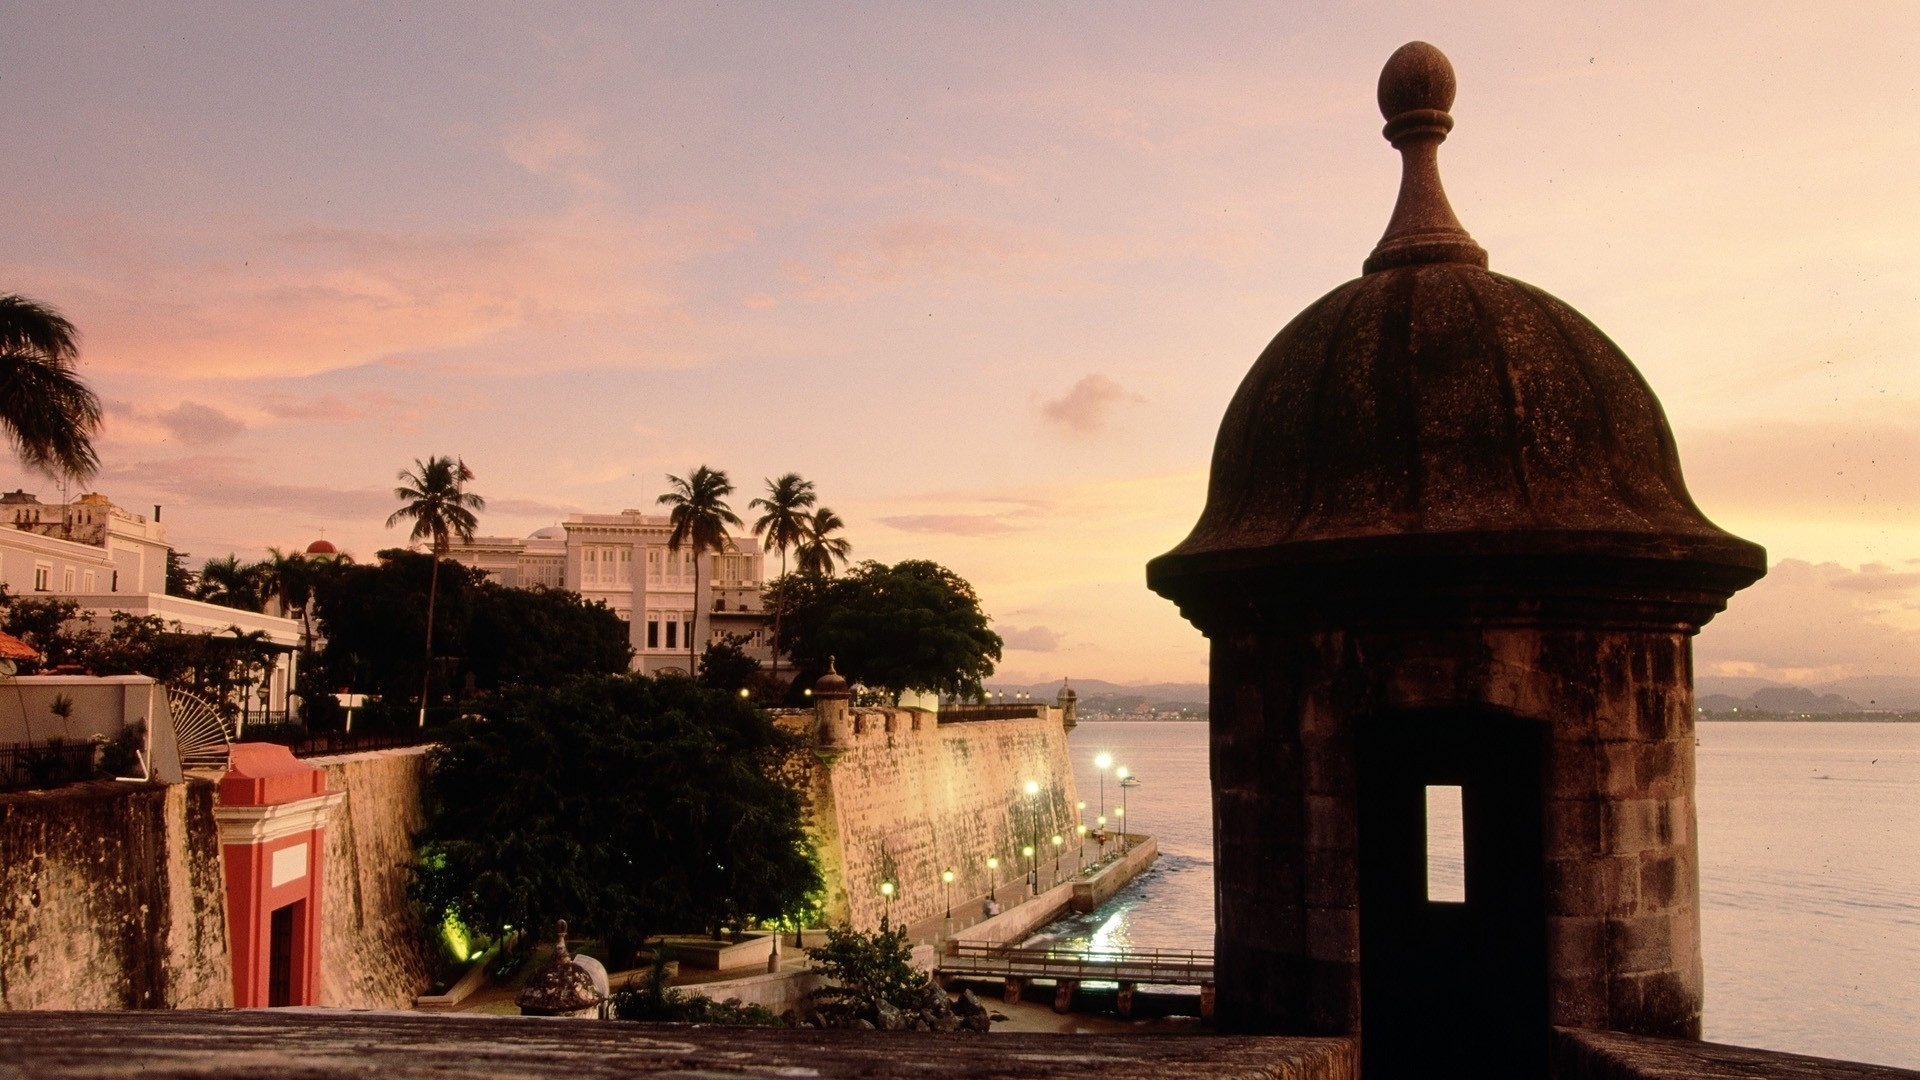 puerto rico san juan hd wallpaper | download free hd wallpapers